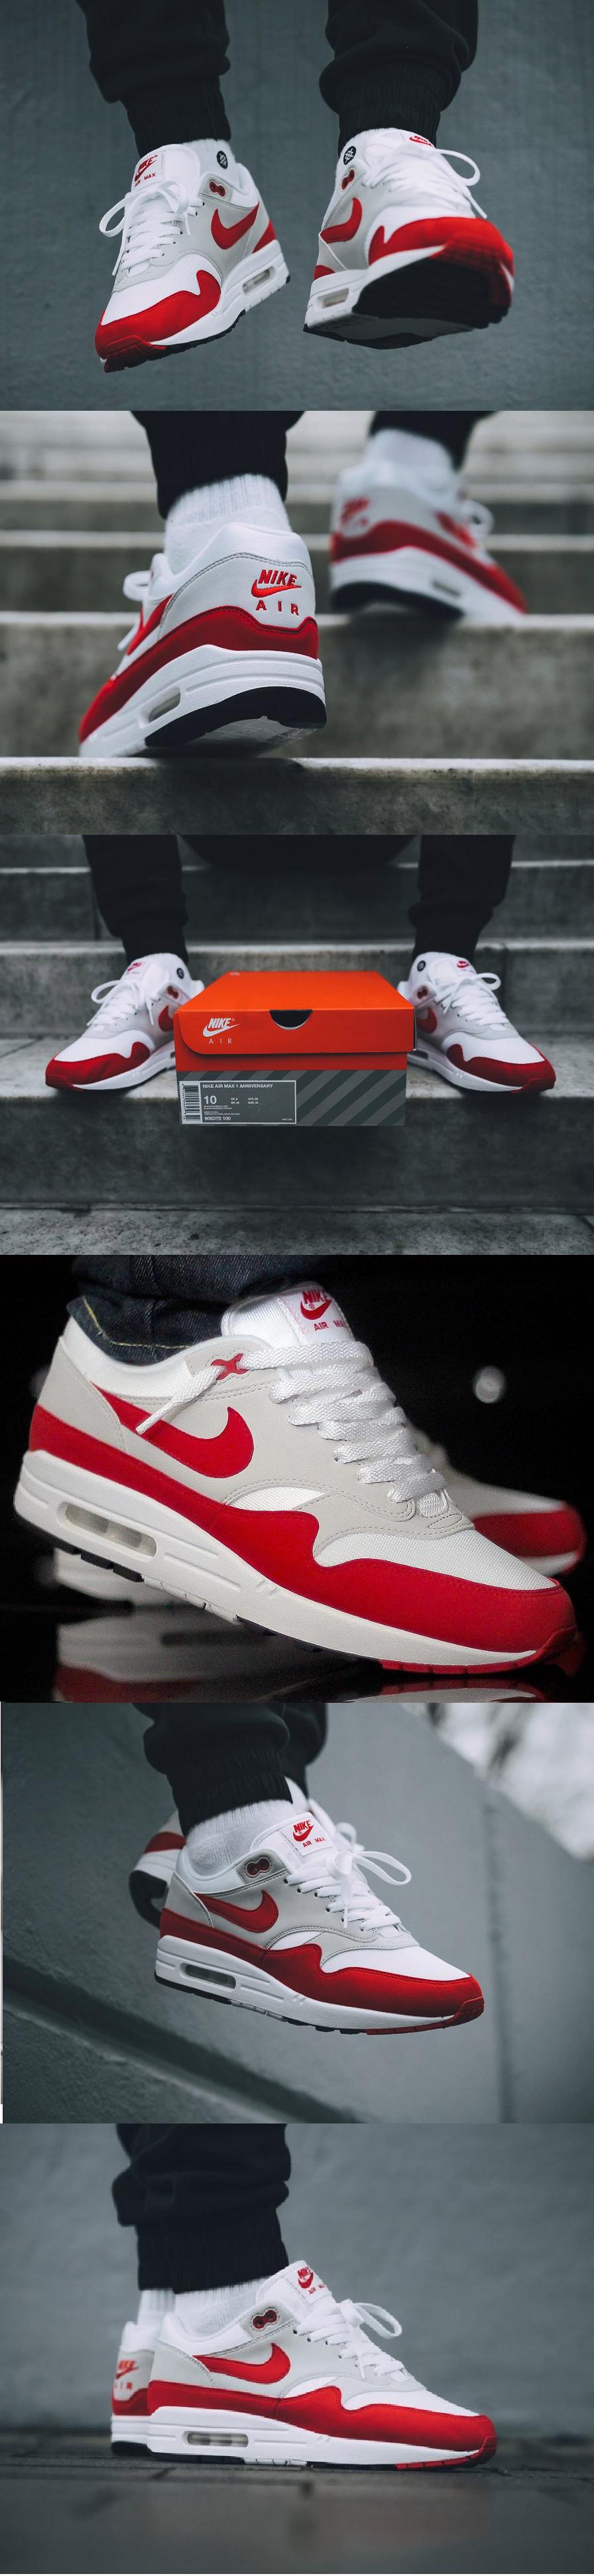 Men's Nike Air Max 1 OG Anniversary